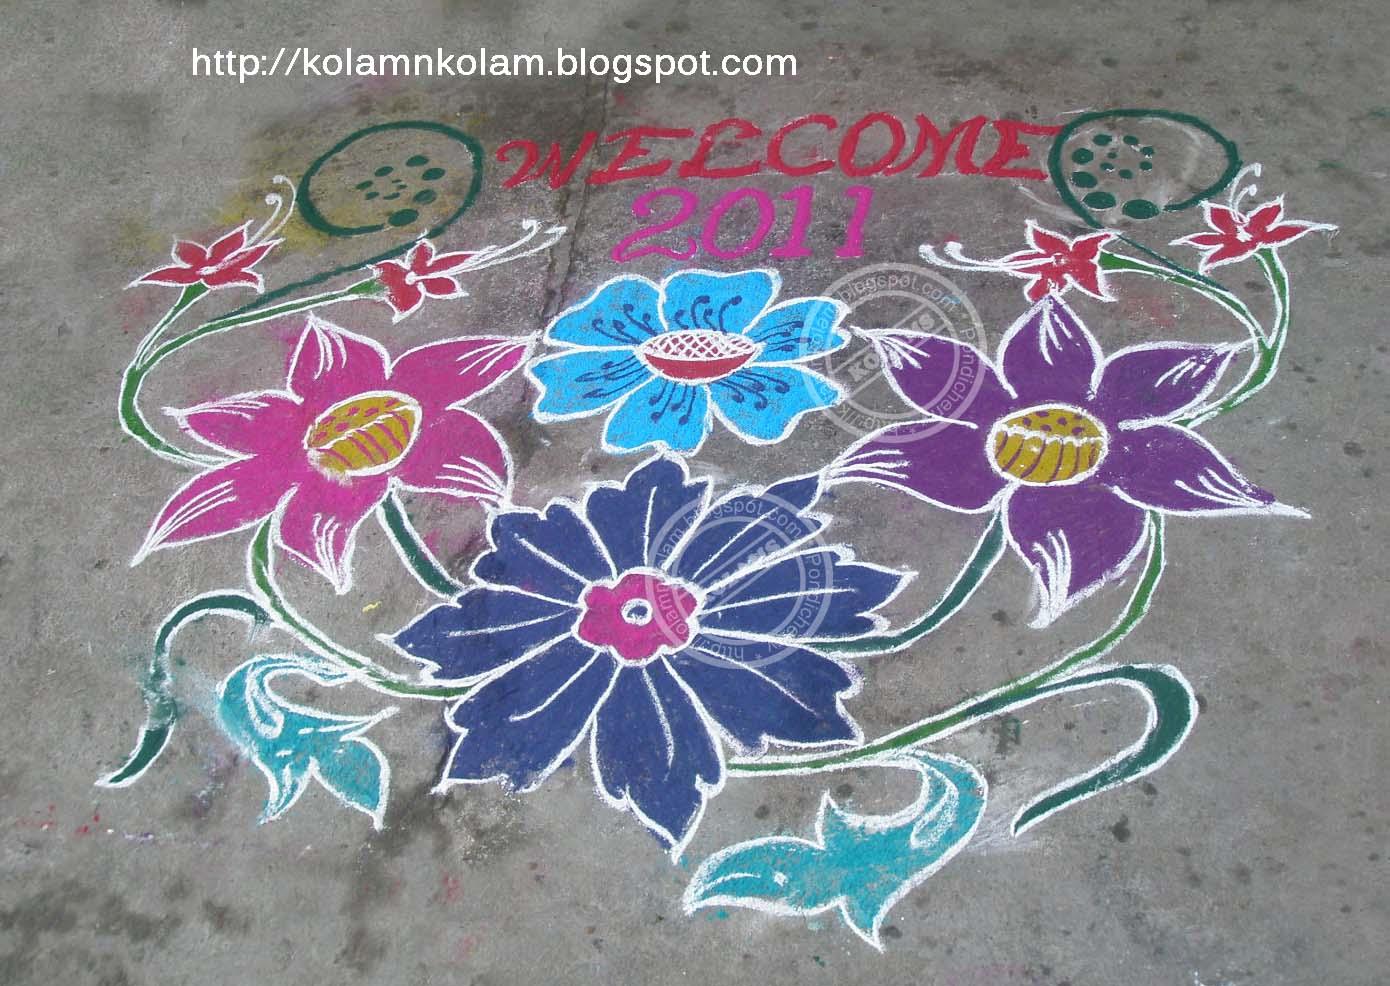 house amma akka telugu sex stories nov tamil sex stories